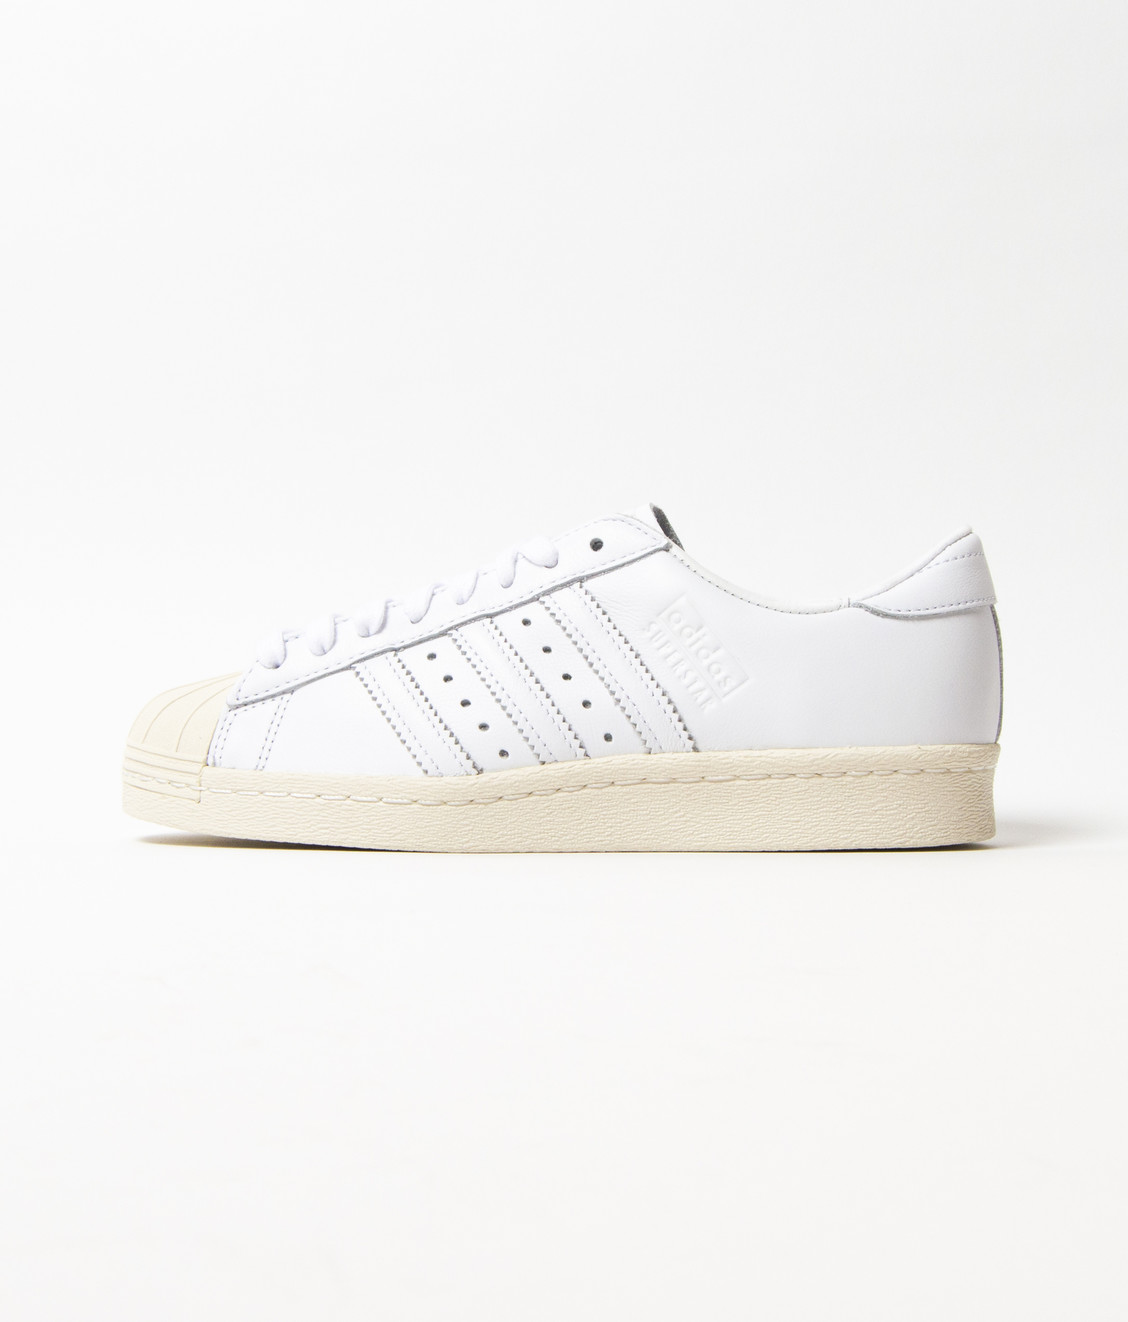 Adidas Adidas HOC Superstar 80's Recon